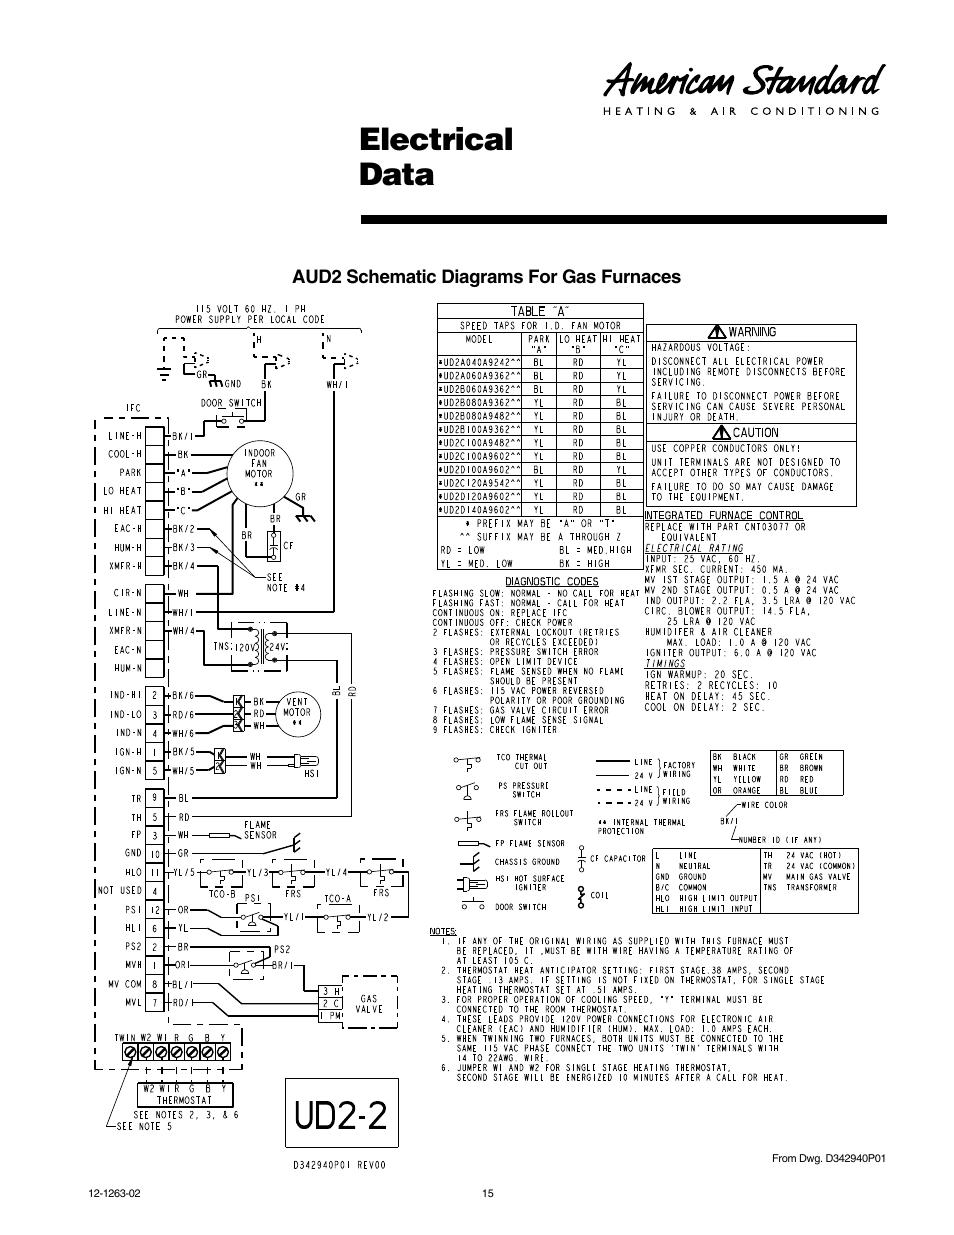 hight resolution of electrical data american standard freedom 80 user manual page 15 rh manualsdir com american standard furnace